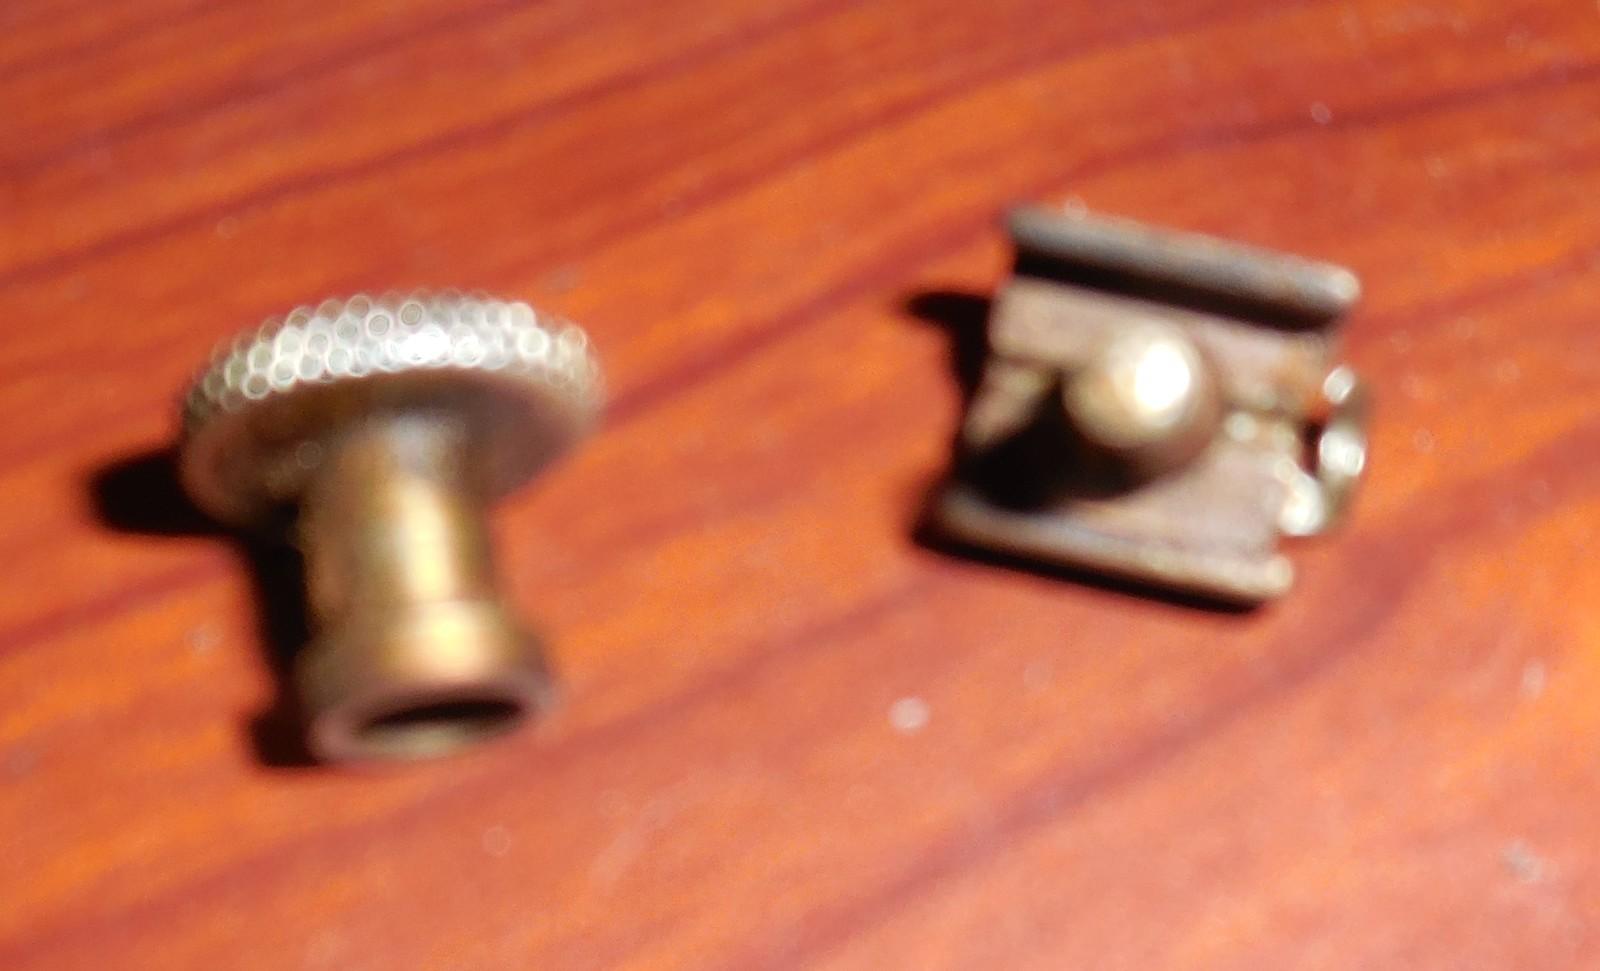 White Rotary 2 Part (Through Needle Bar) Needle Clamp Antique Works - $10.00